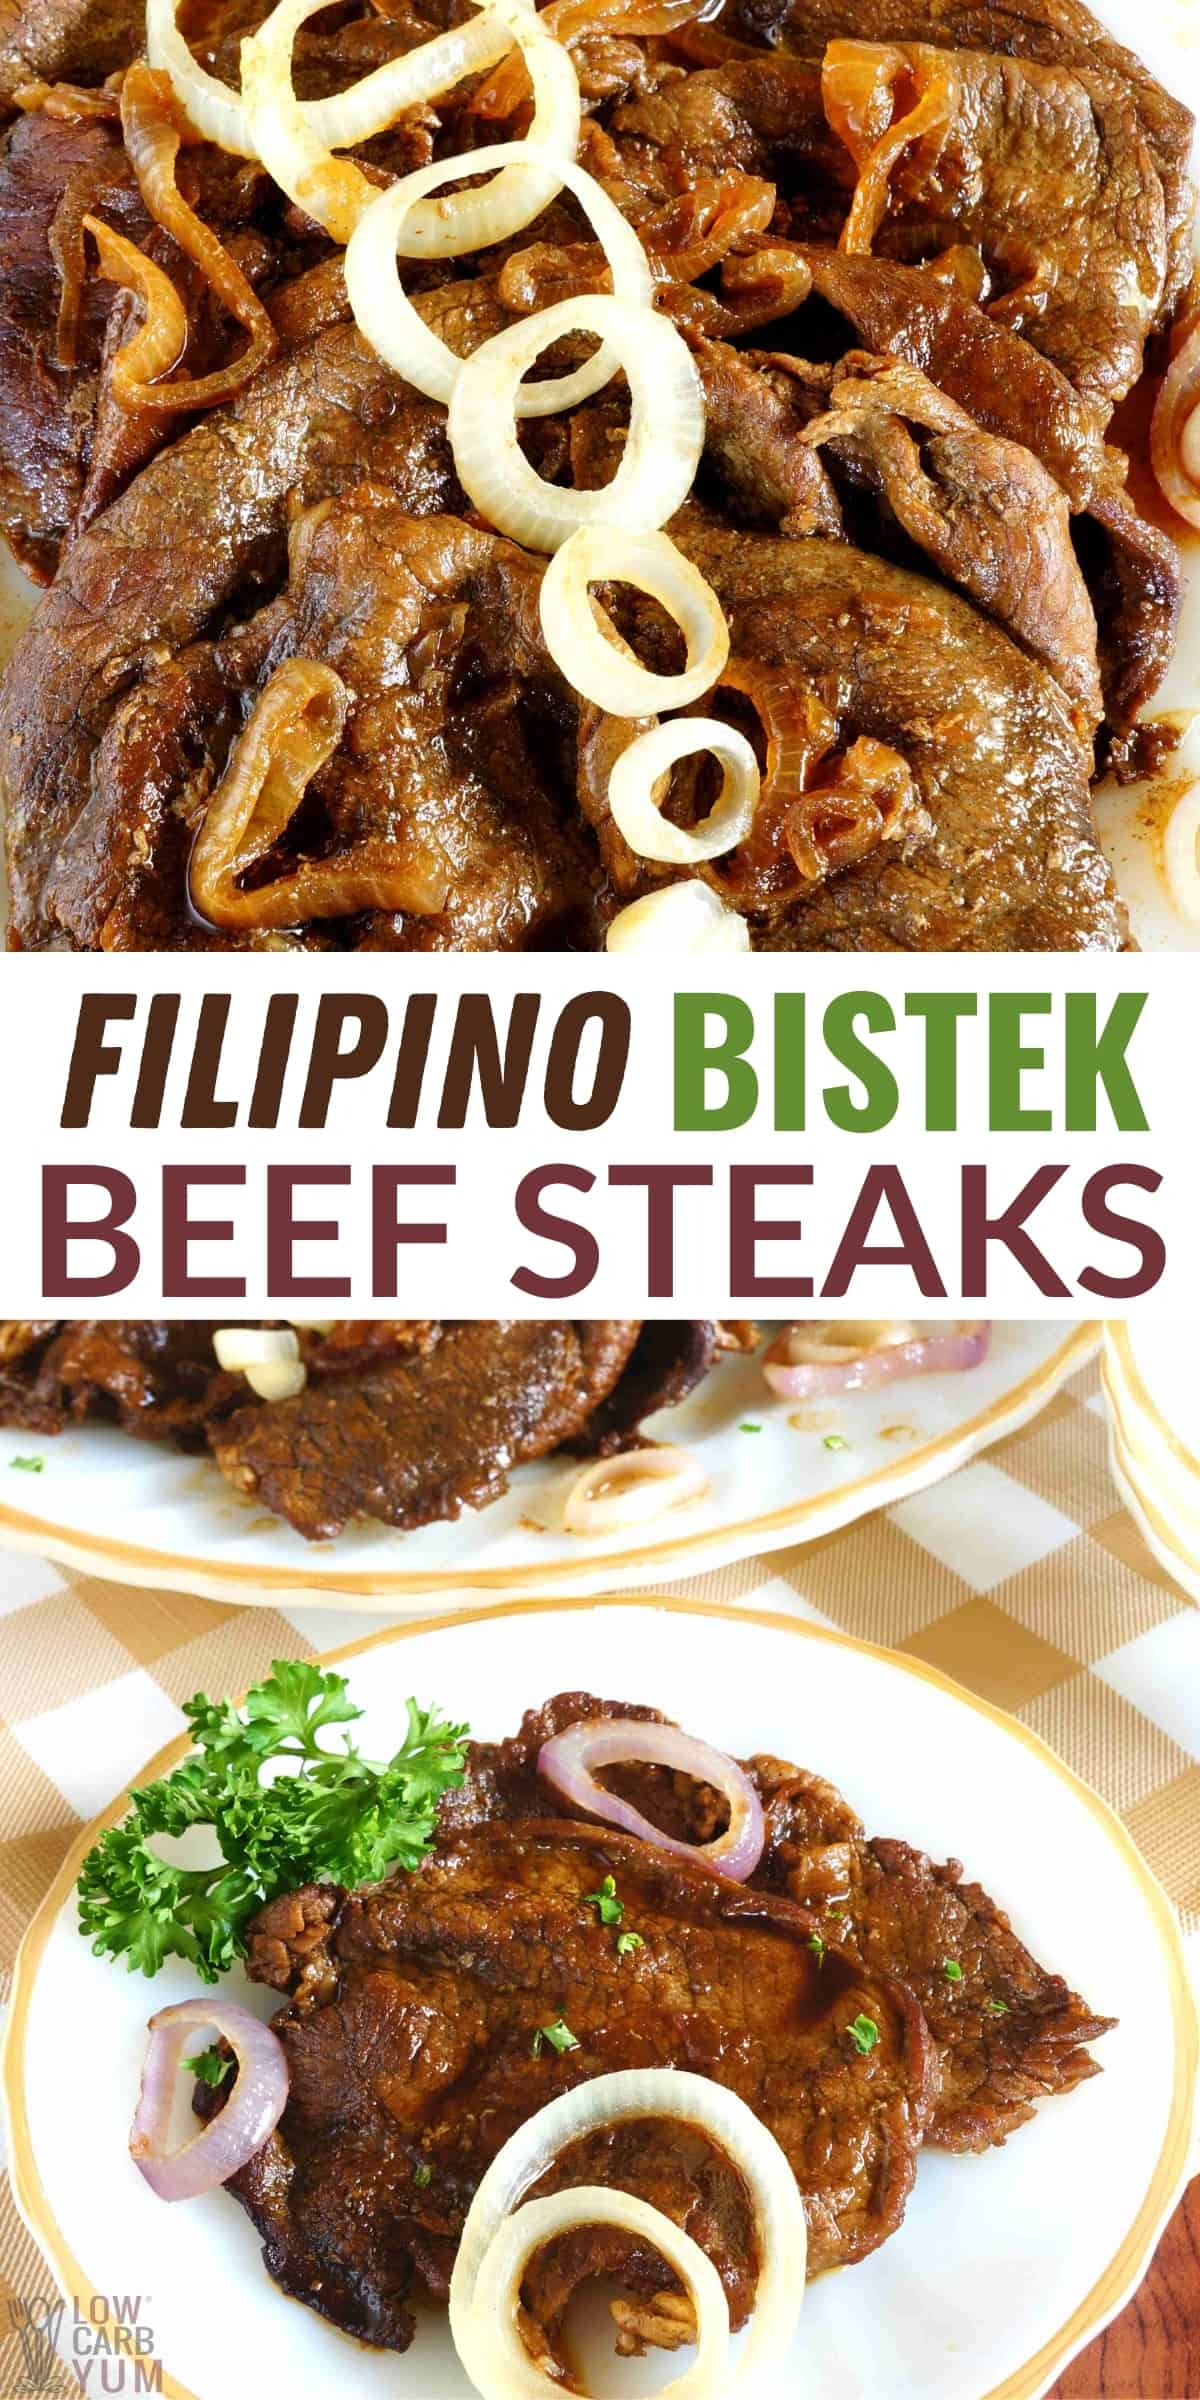 filipino bistek beef steaks pinterest image